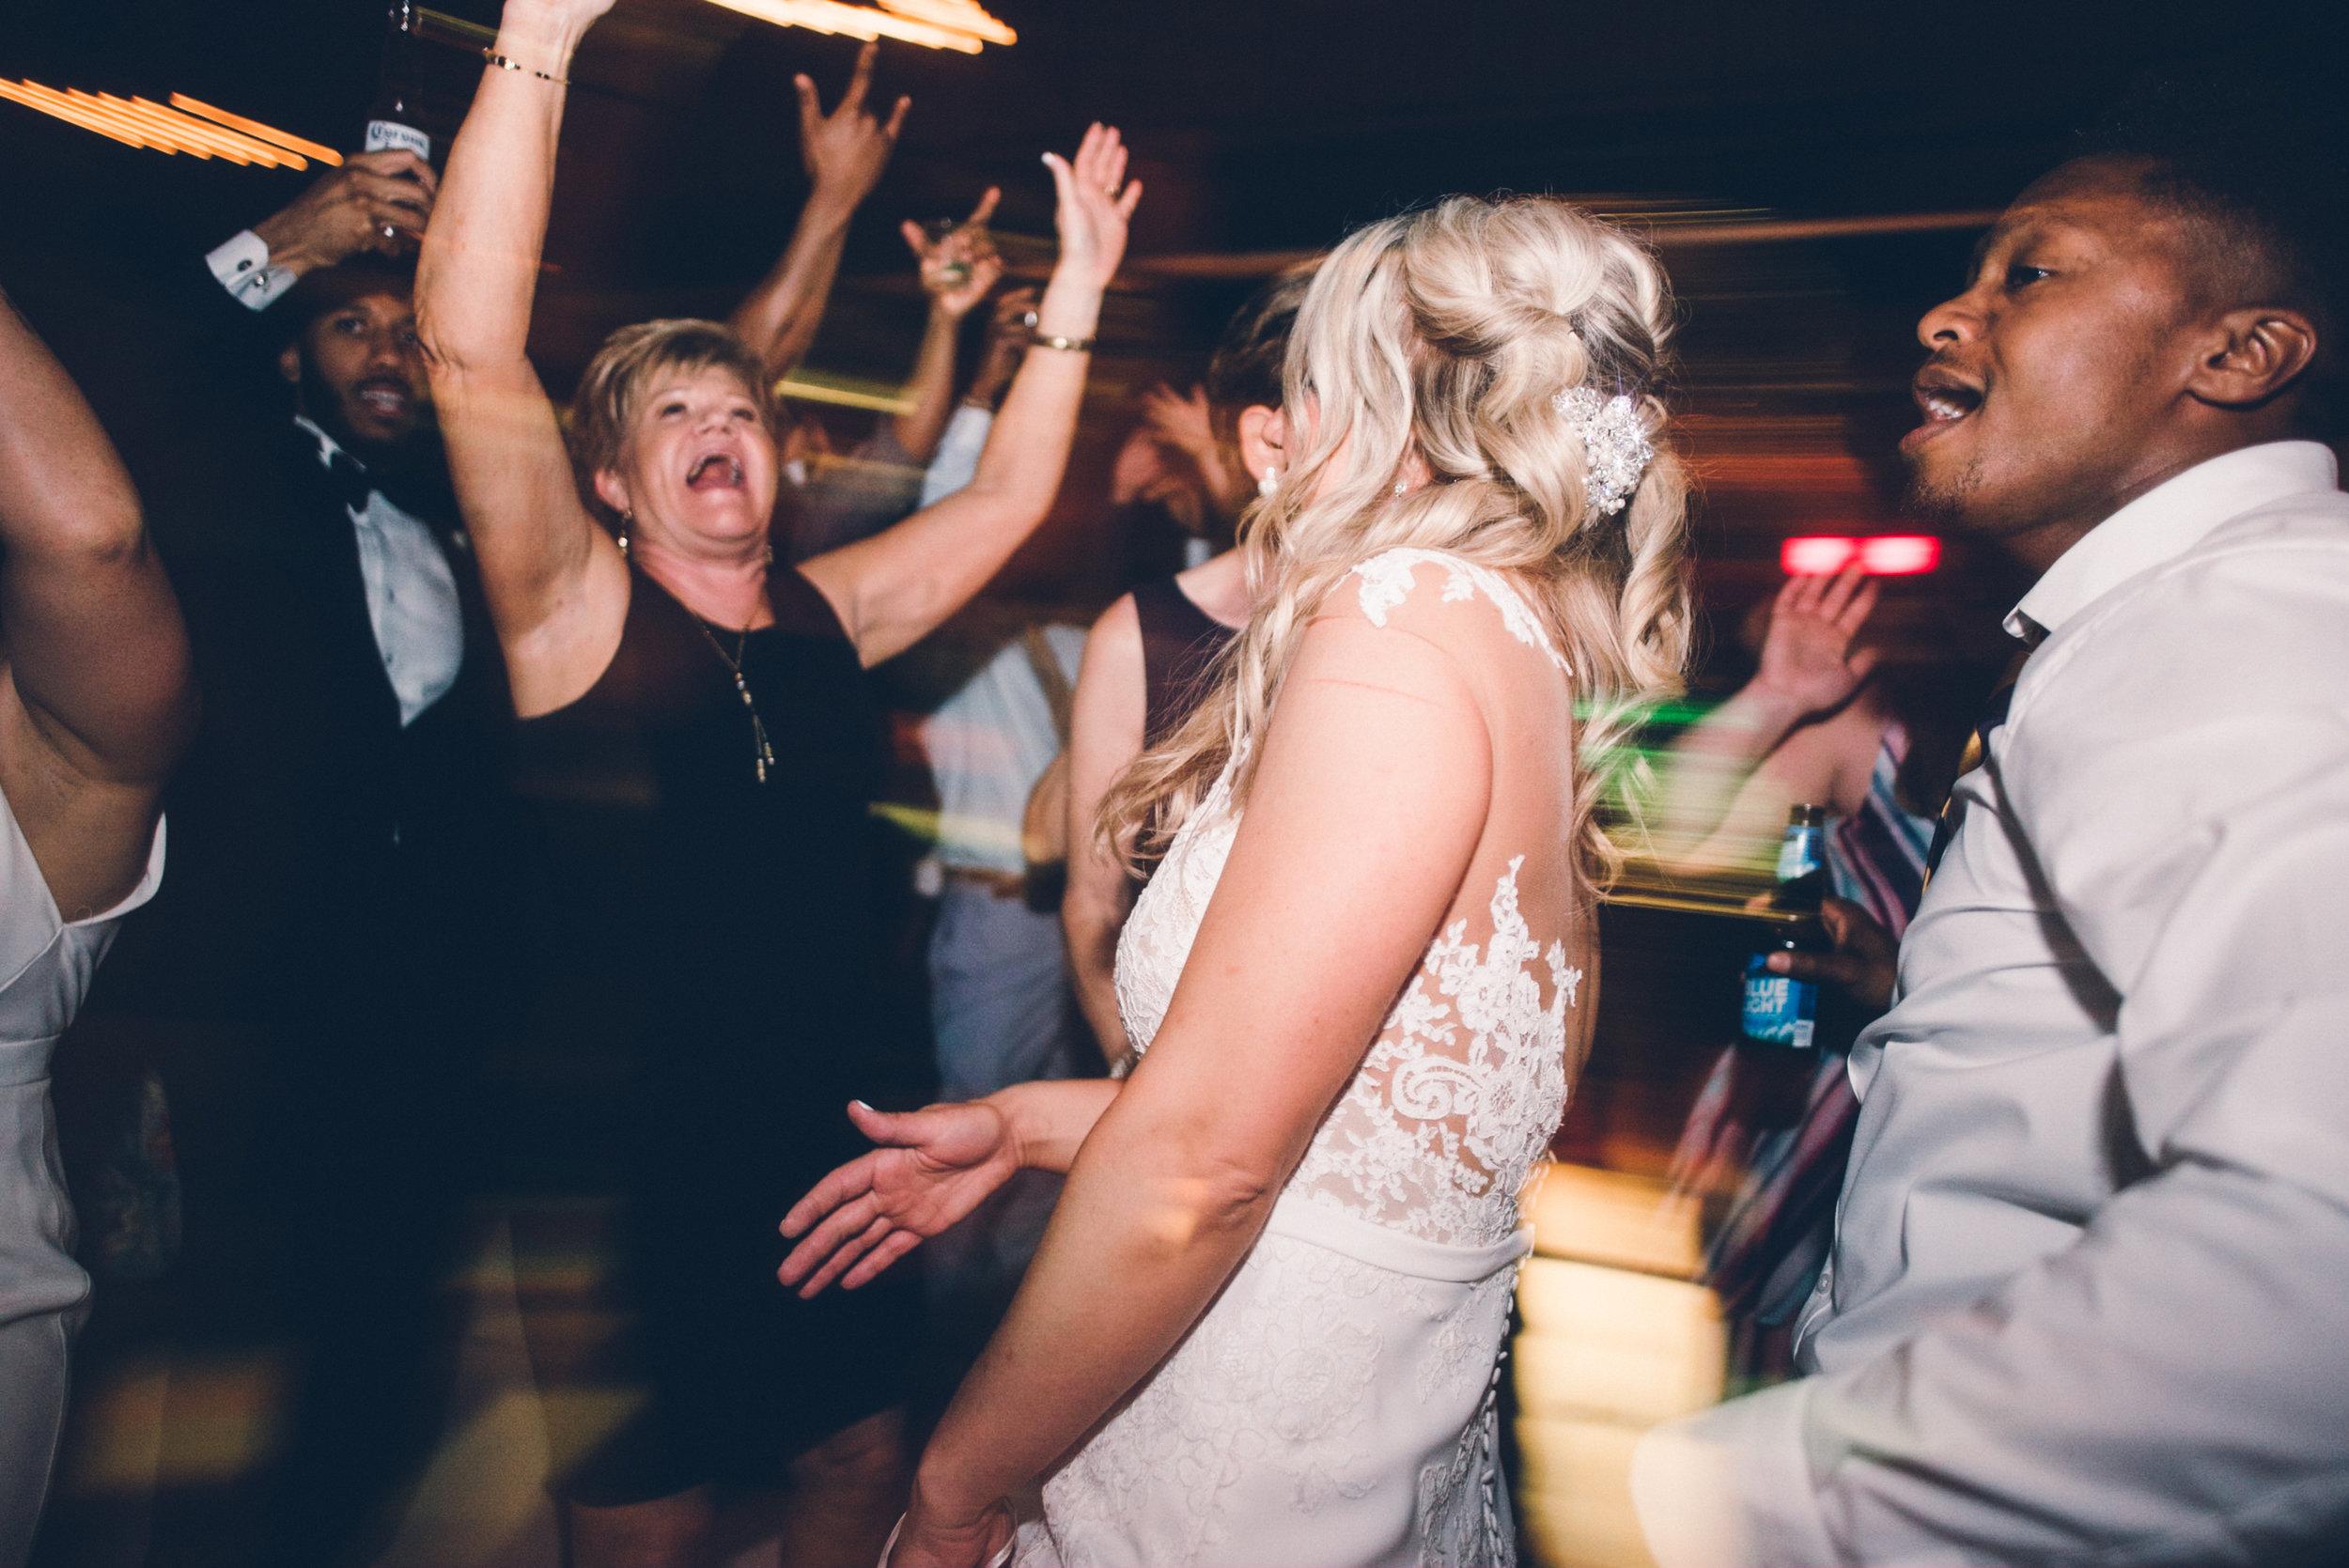 Pittsburgh Pennsylvania New York NYC Wedding Photographer Photojournalist Luxury Downtown Opera - Stirpe 1466.jpg